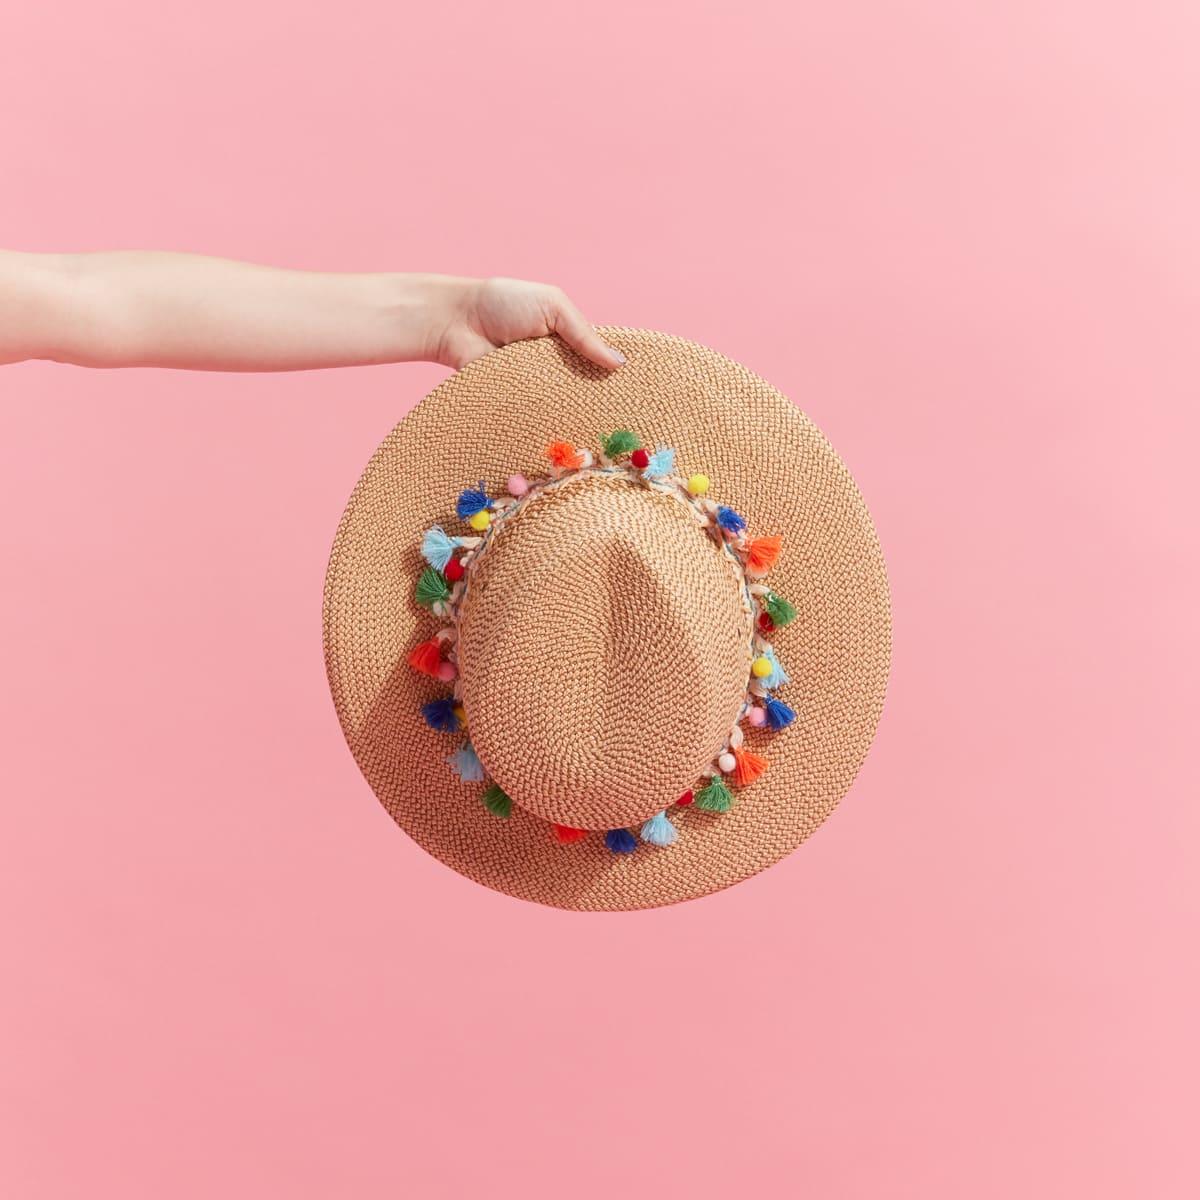 Women's crochet sun hat with pom poms